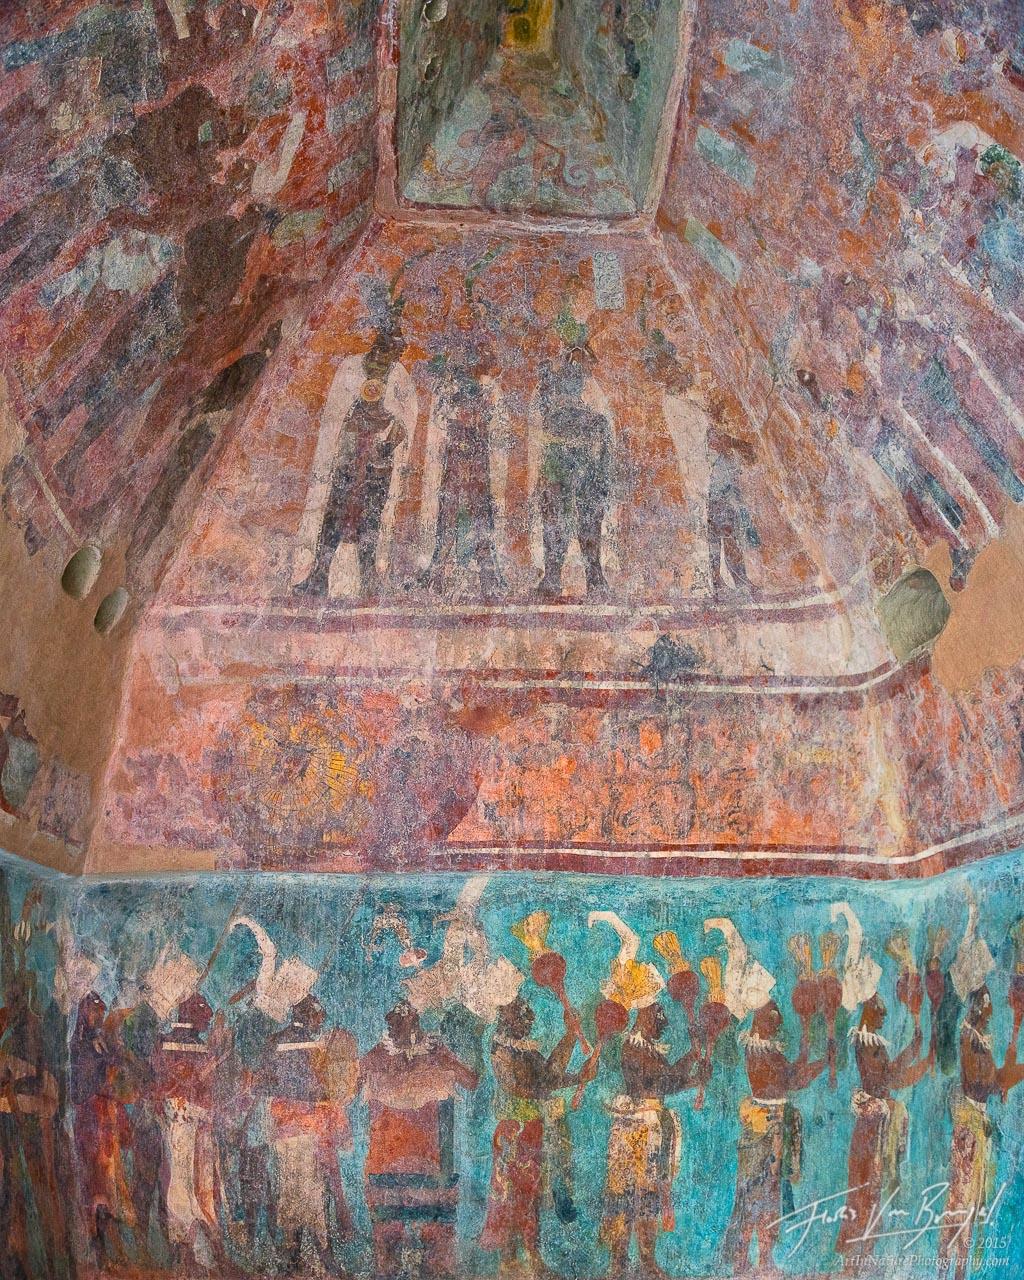 Bonampak Murals, Maya Ruins, Chiapas, photo